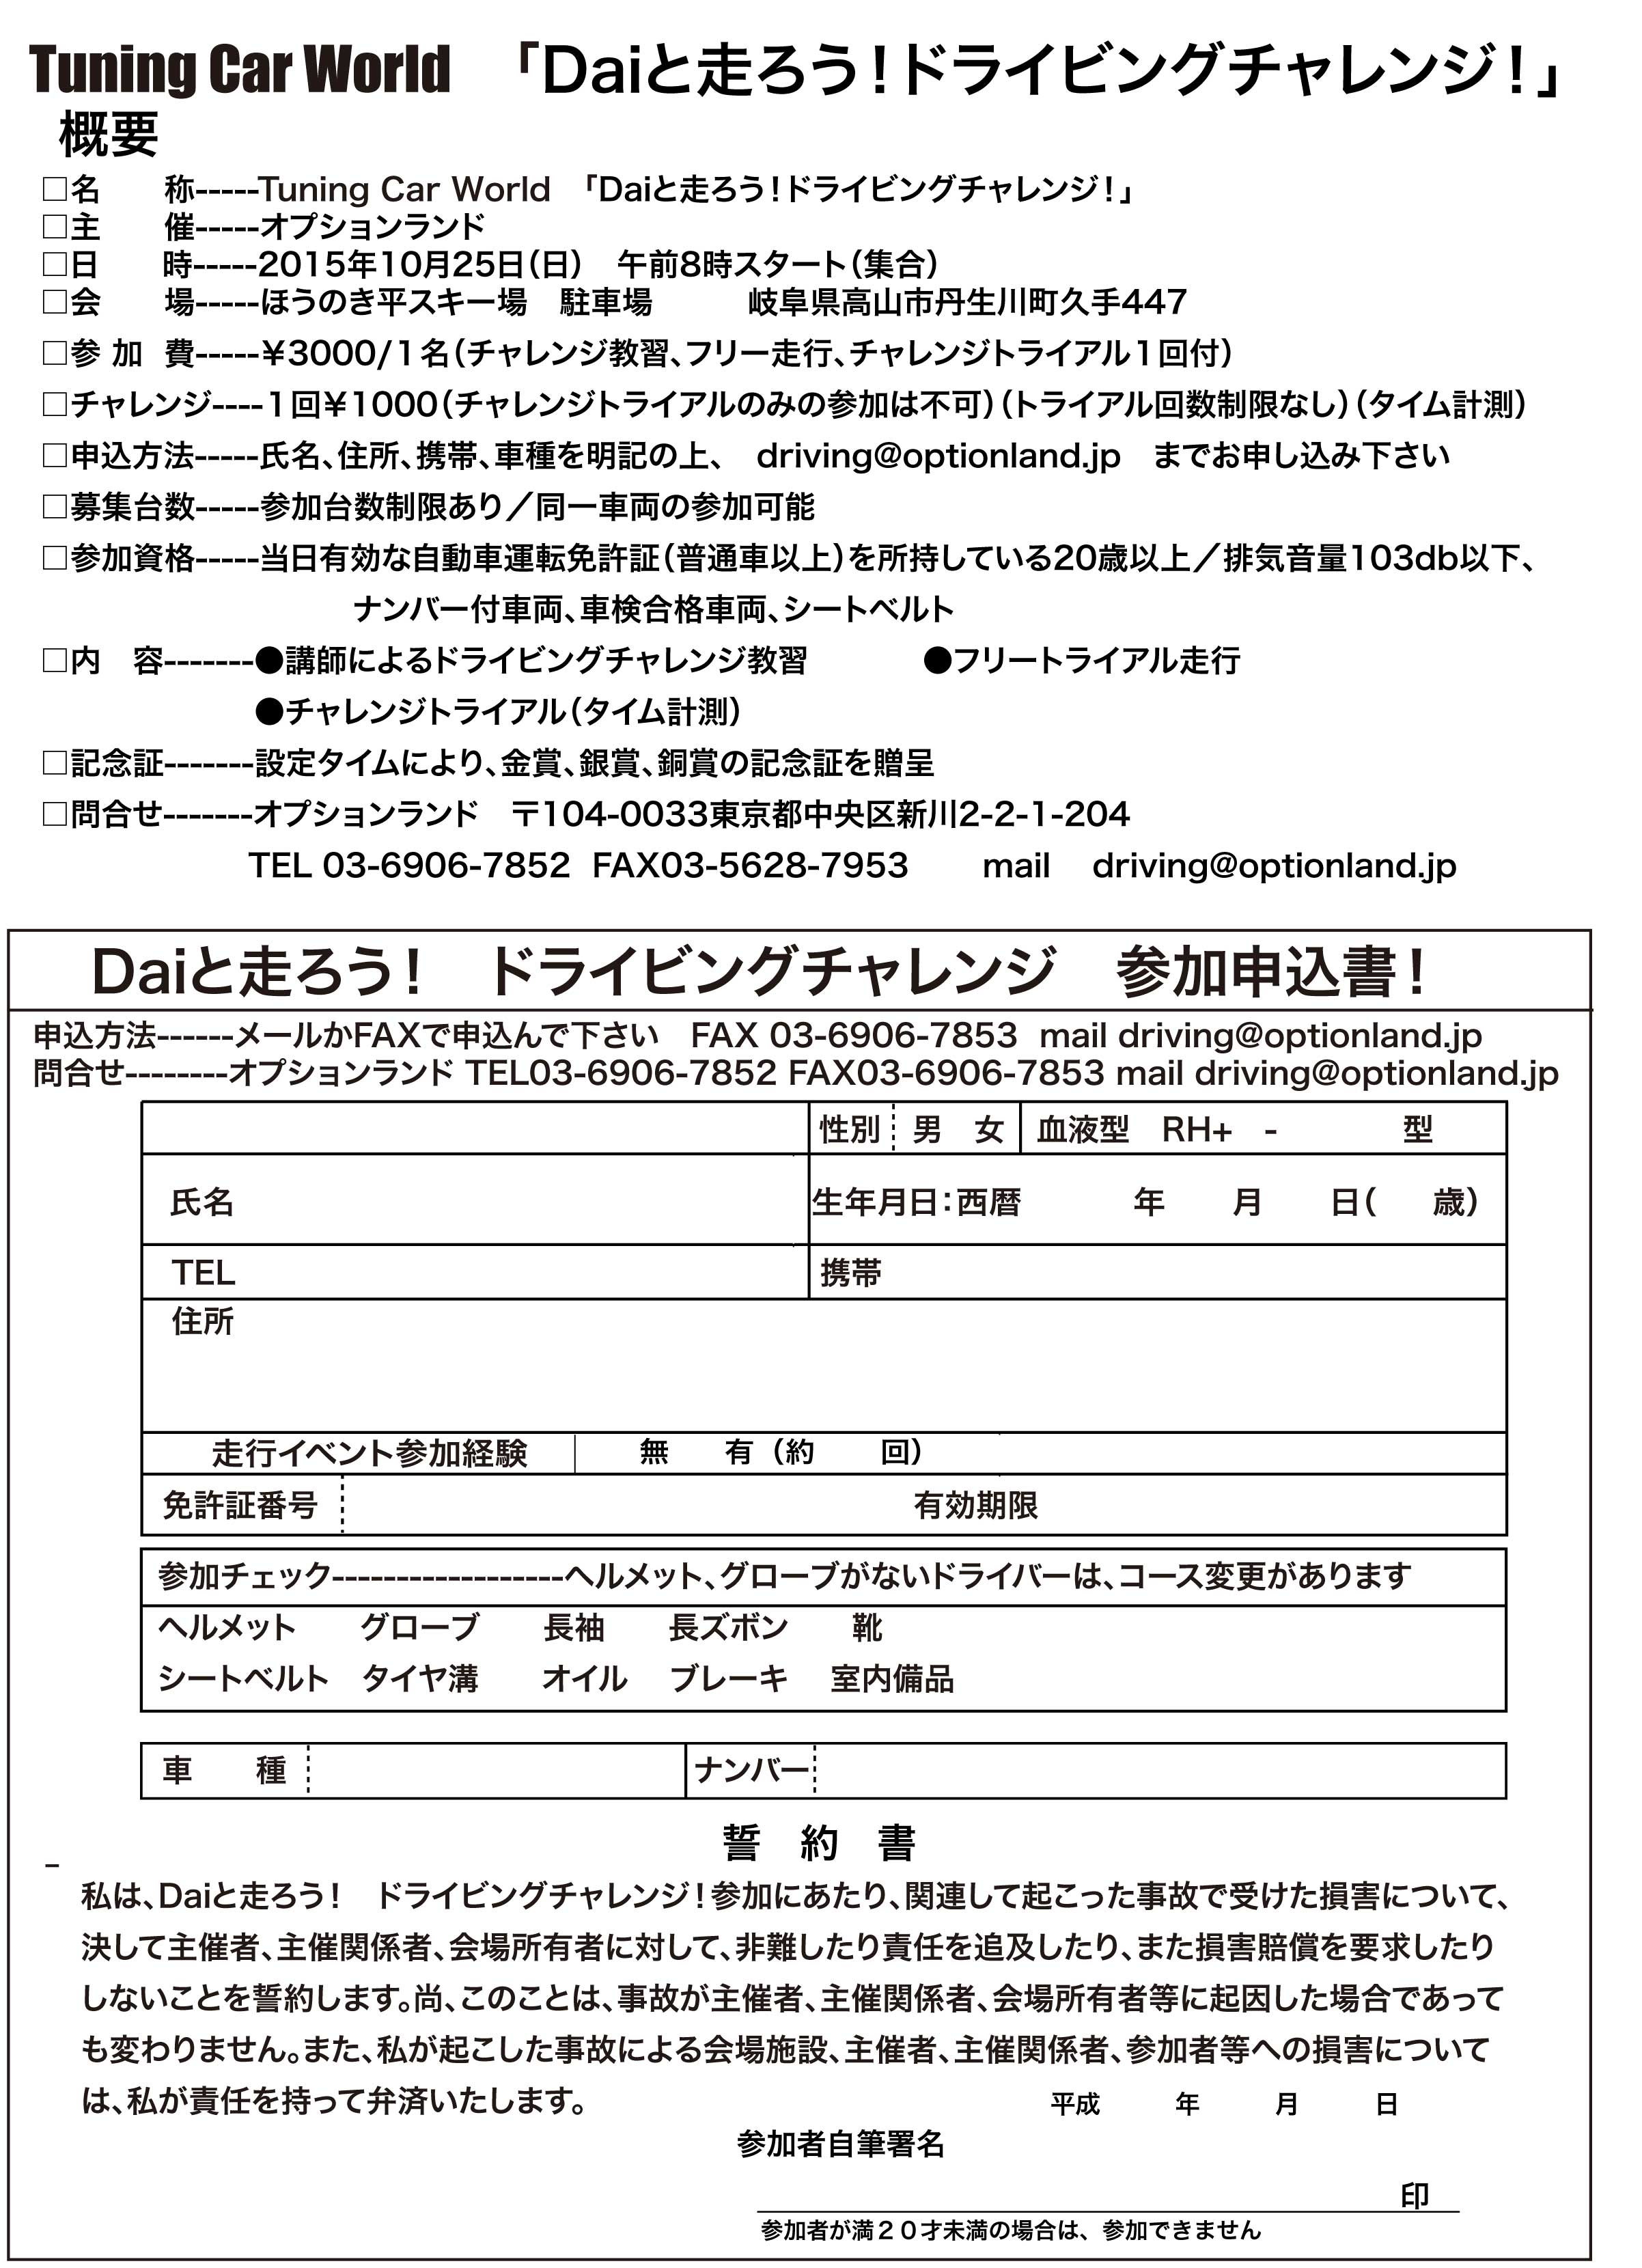 driving_challenge_honoki-2.jpg